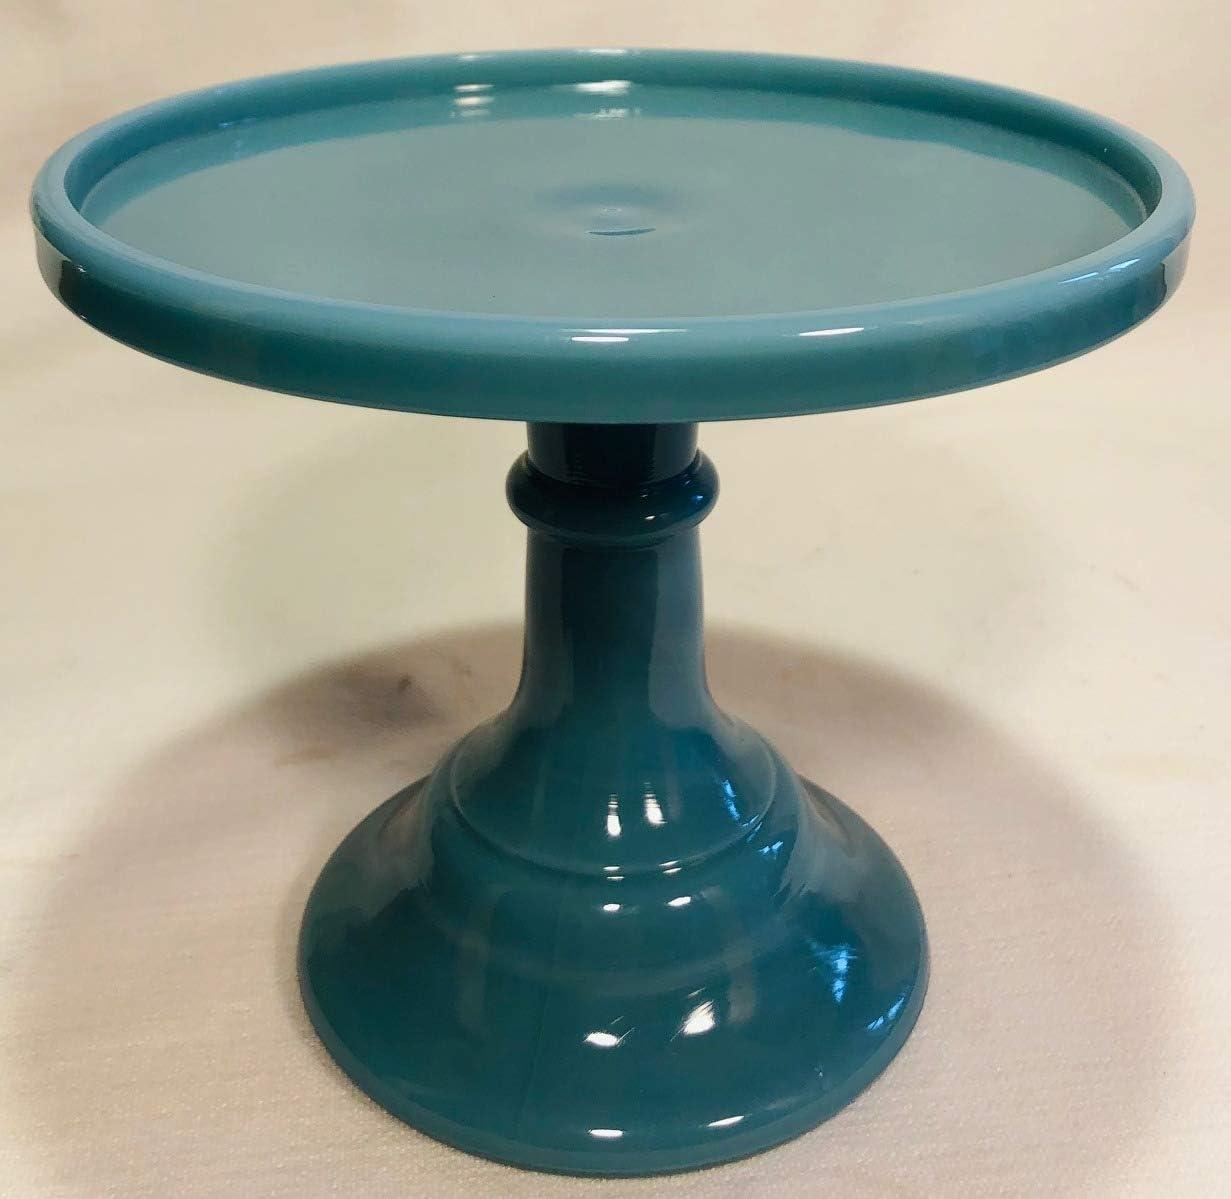 Sacramento Mall Cake Sale price Plate Round Plain Simple Glass Mosser Blue Georgia 6